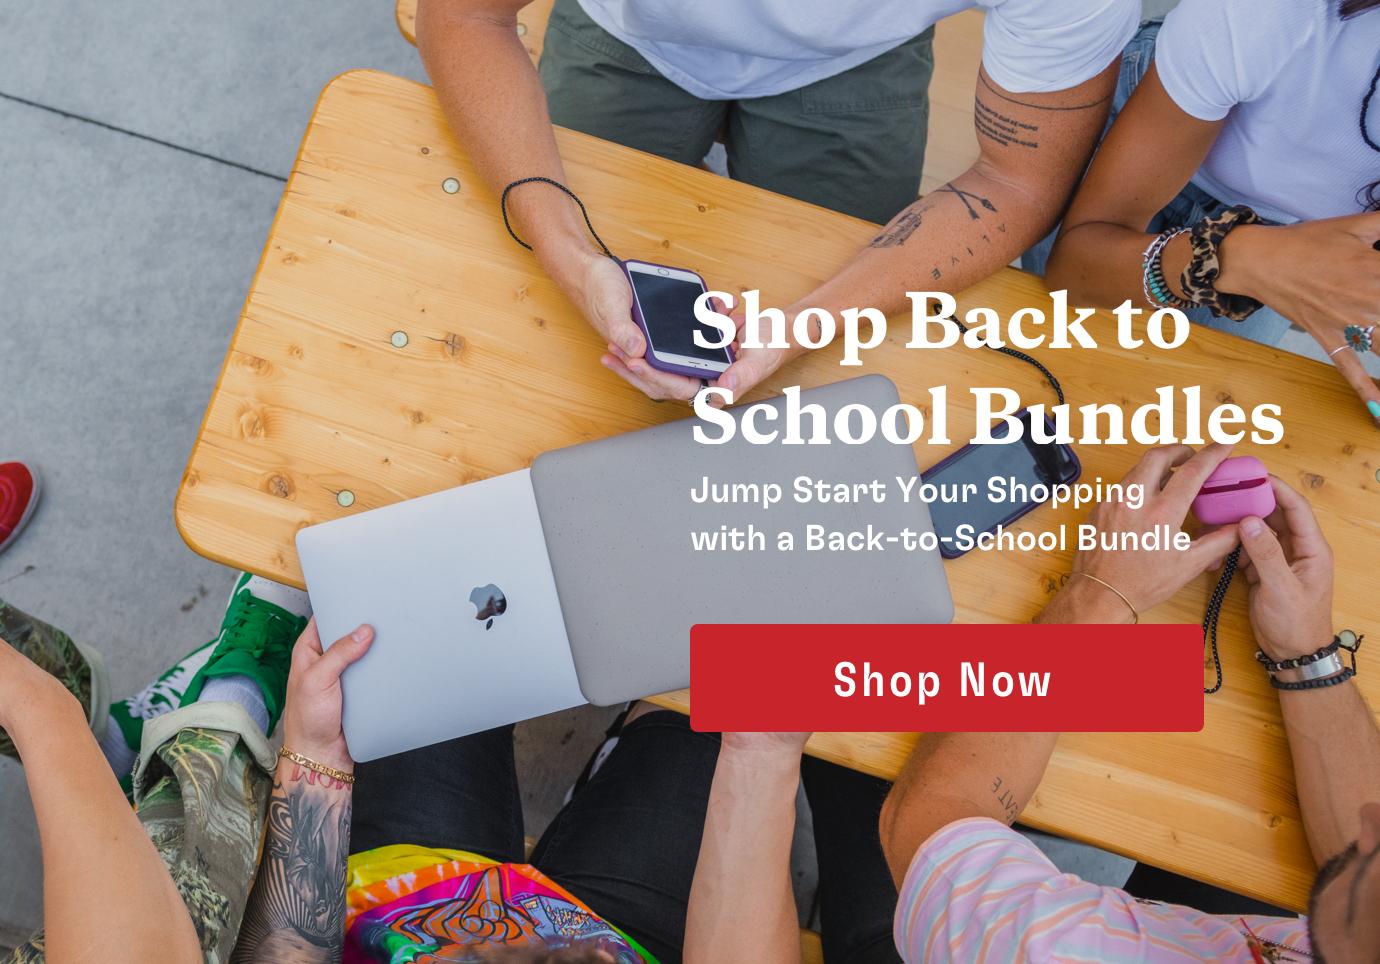 Shop Back to School Bundles